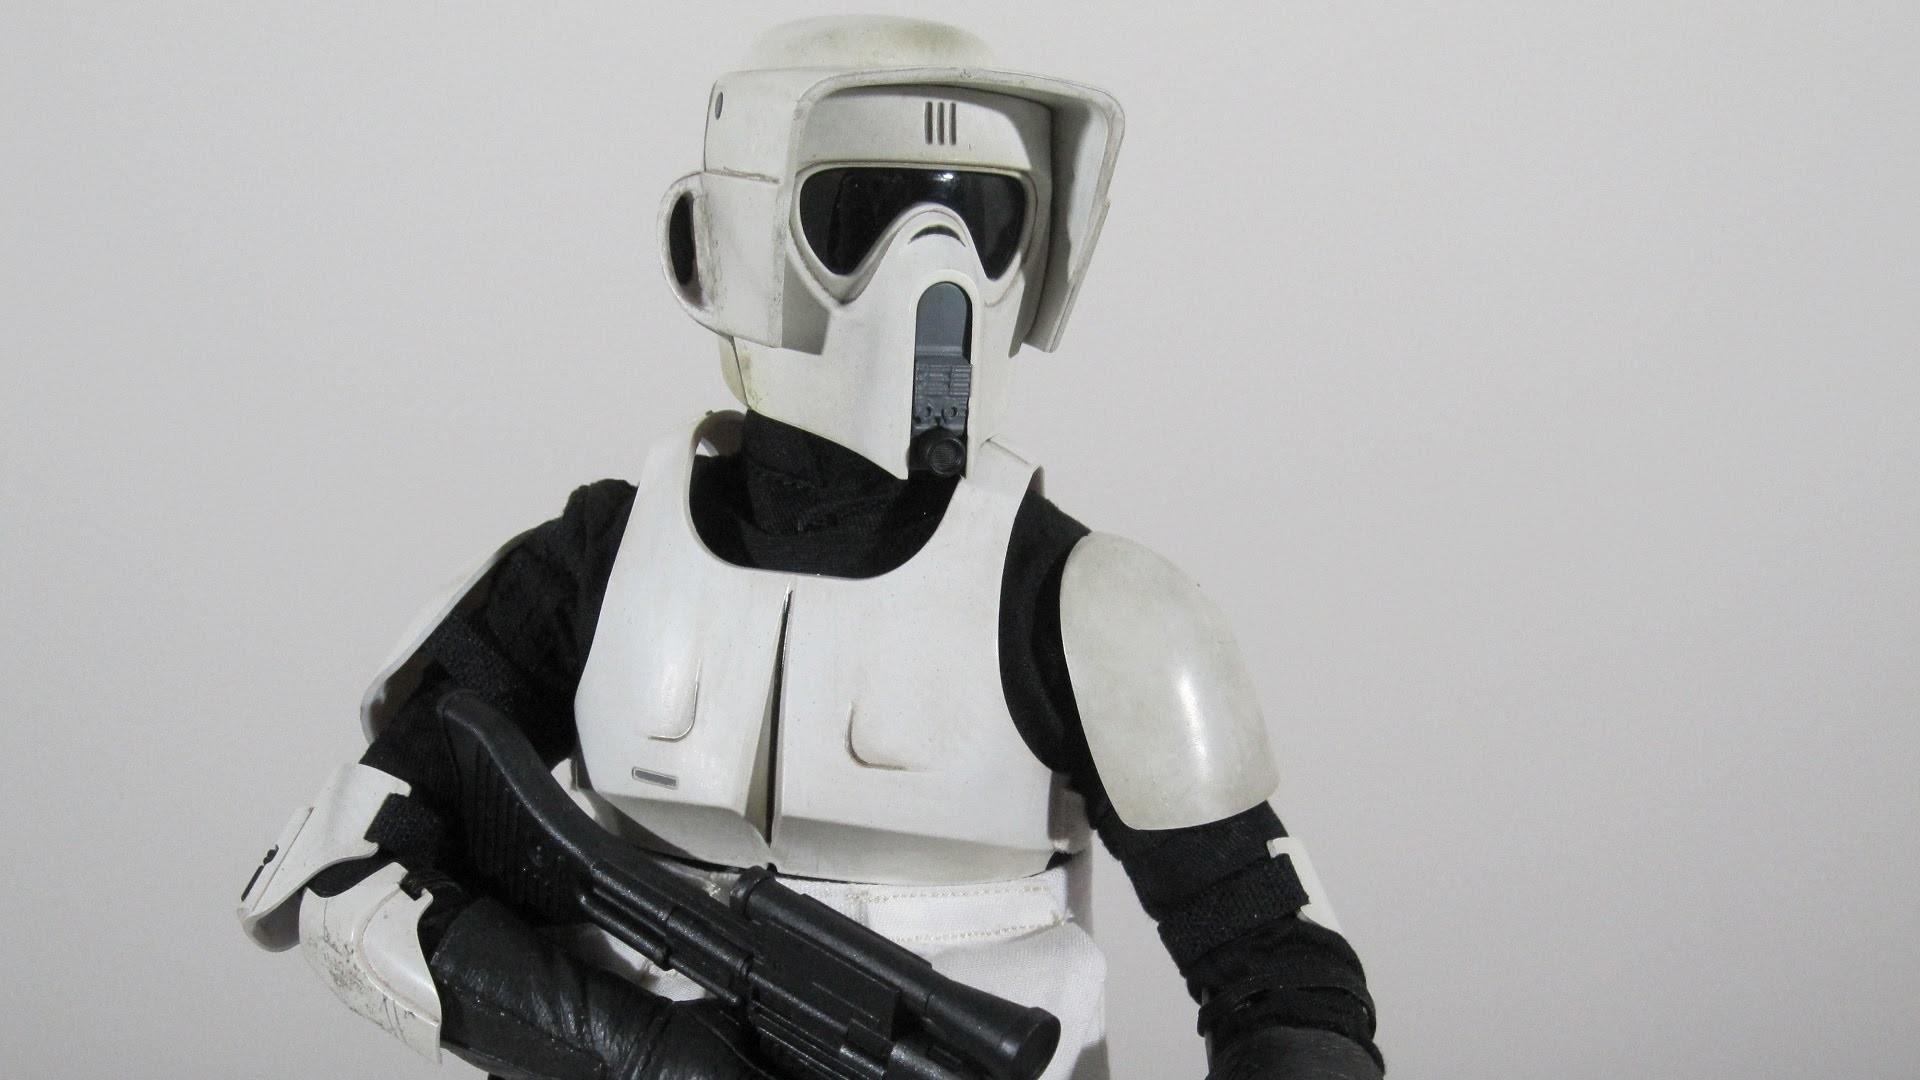 Lego Star Wars Wallpaper Hd Star Wars Scout Trooper Wallpaper 64 Images